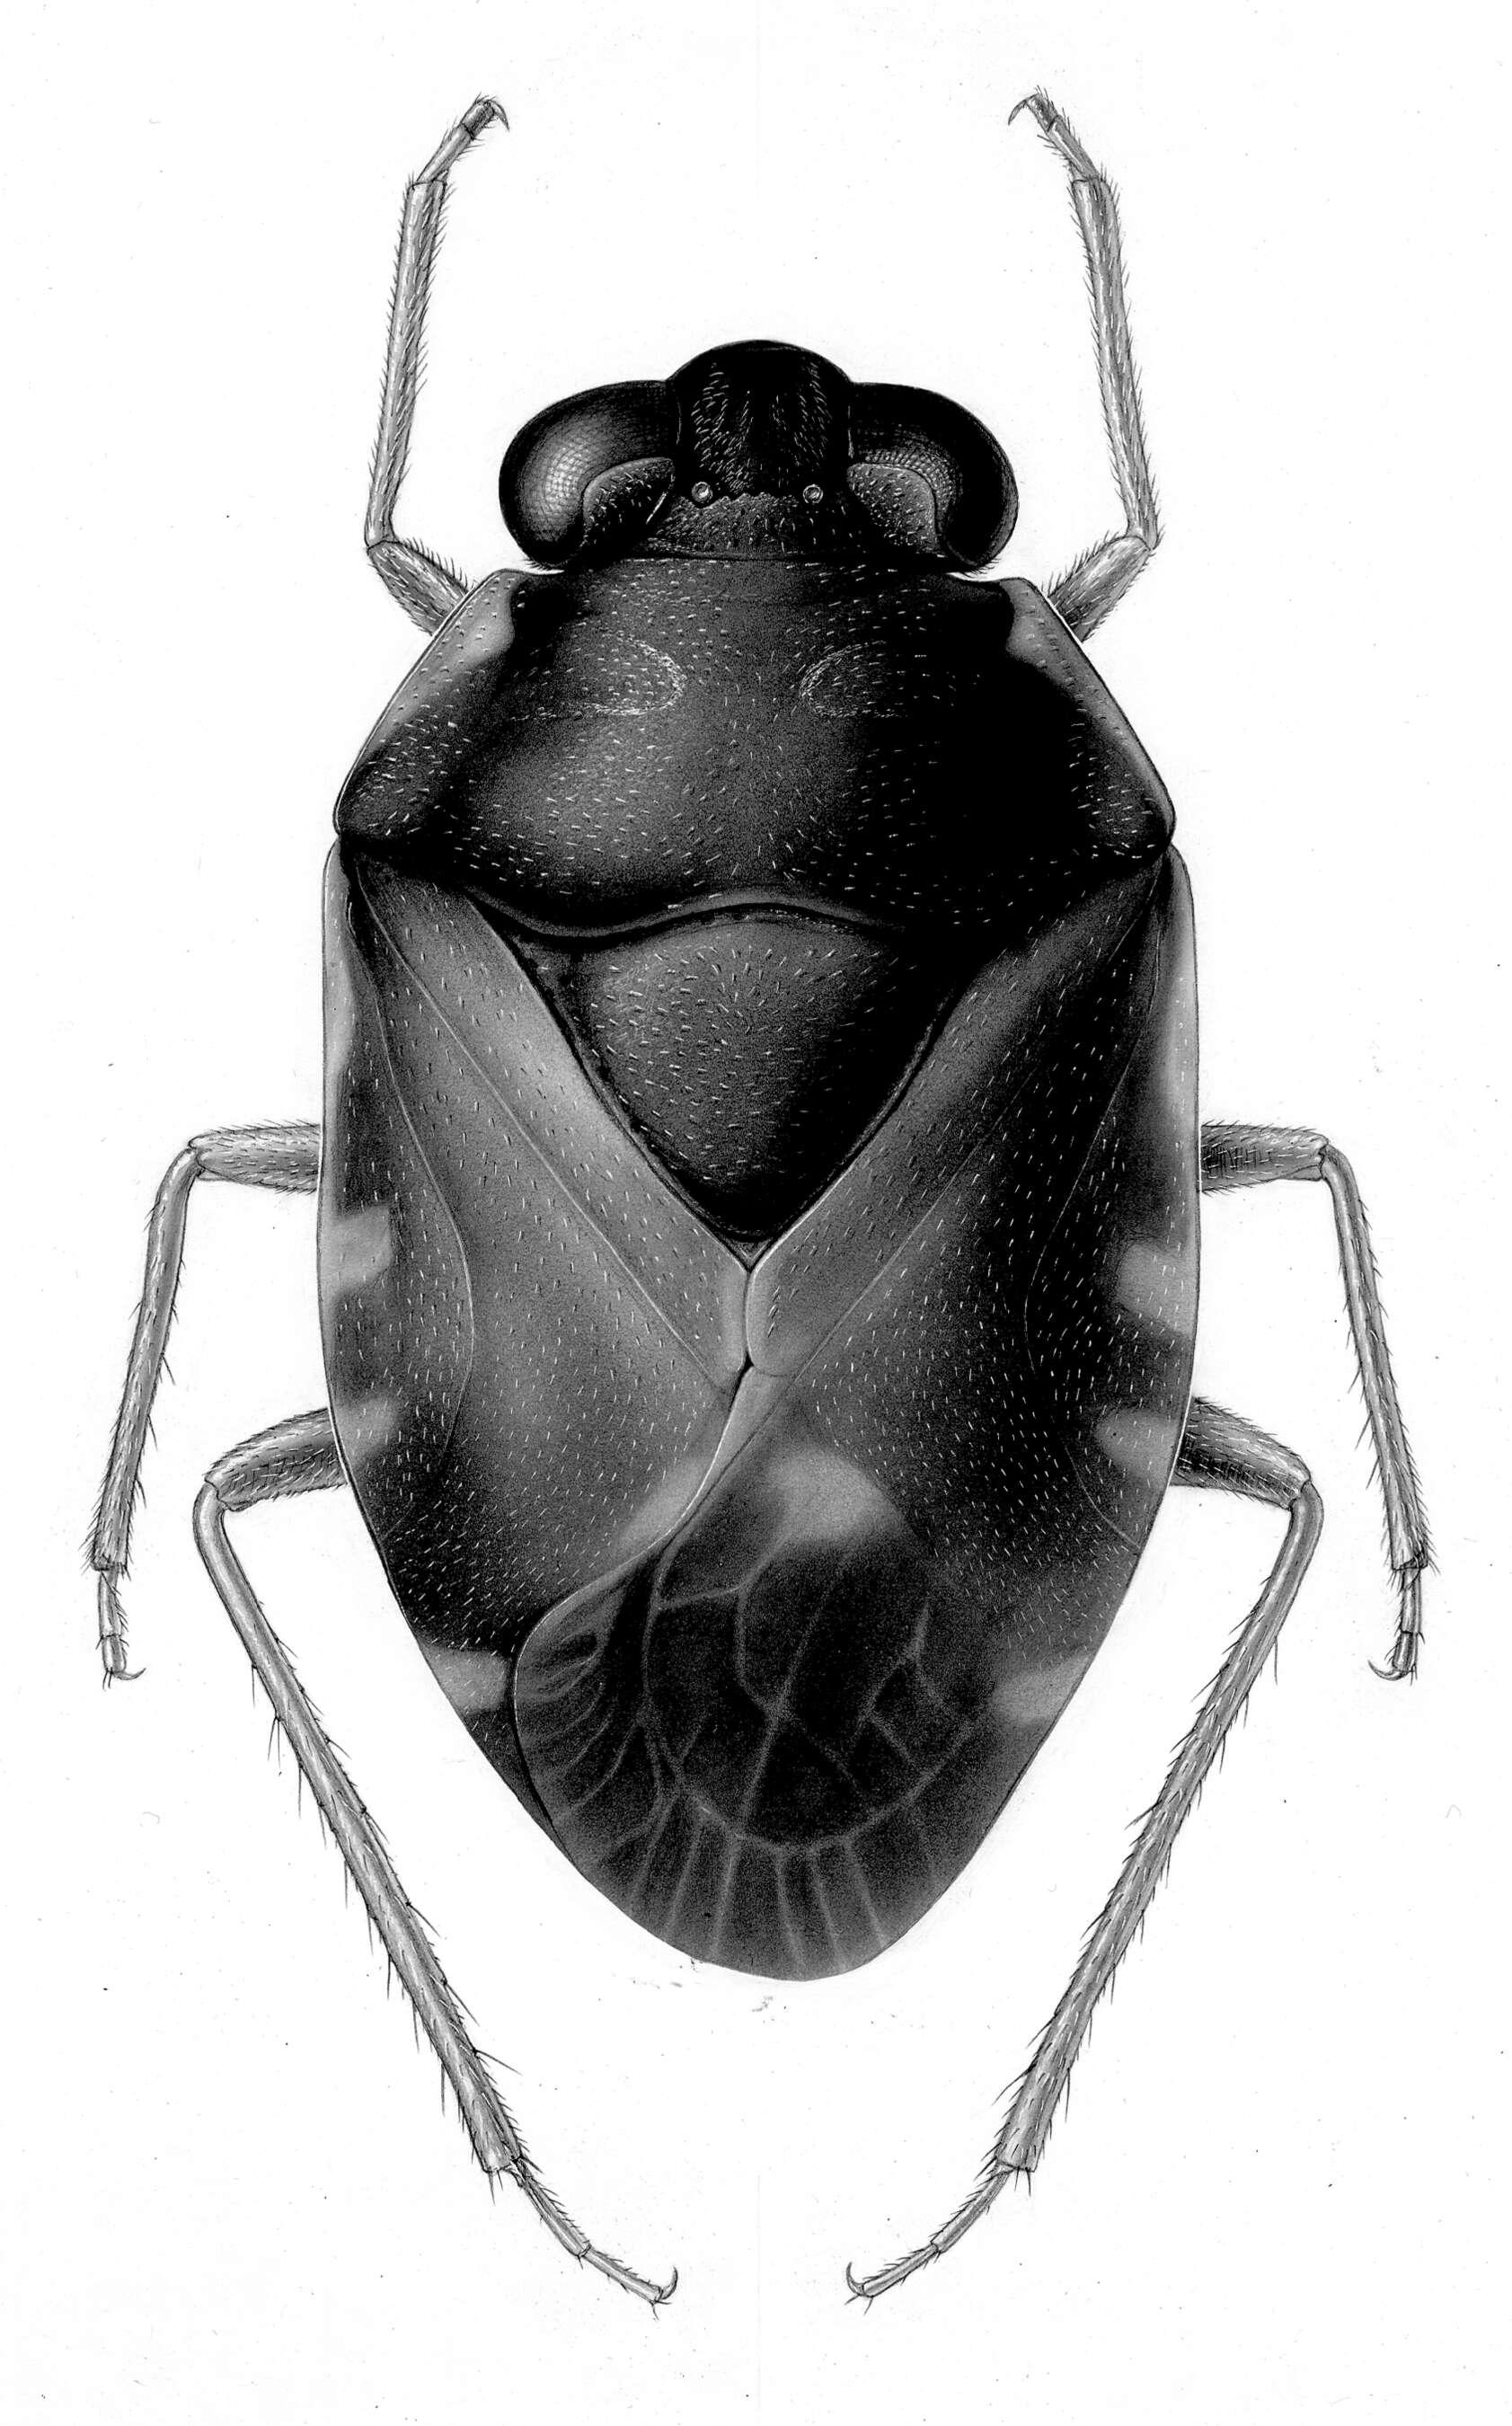 Image of true bugs